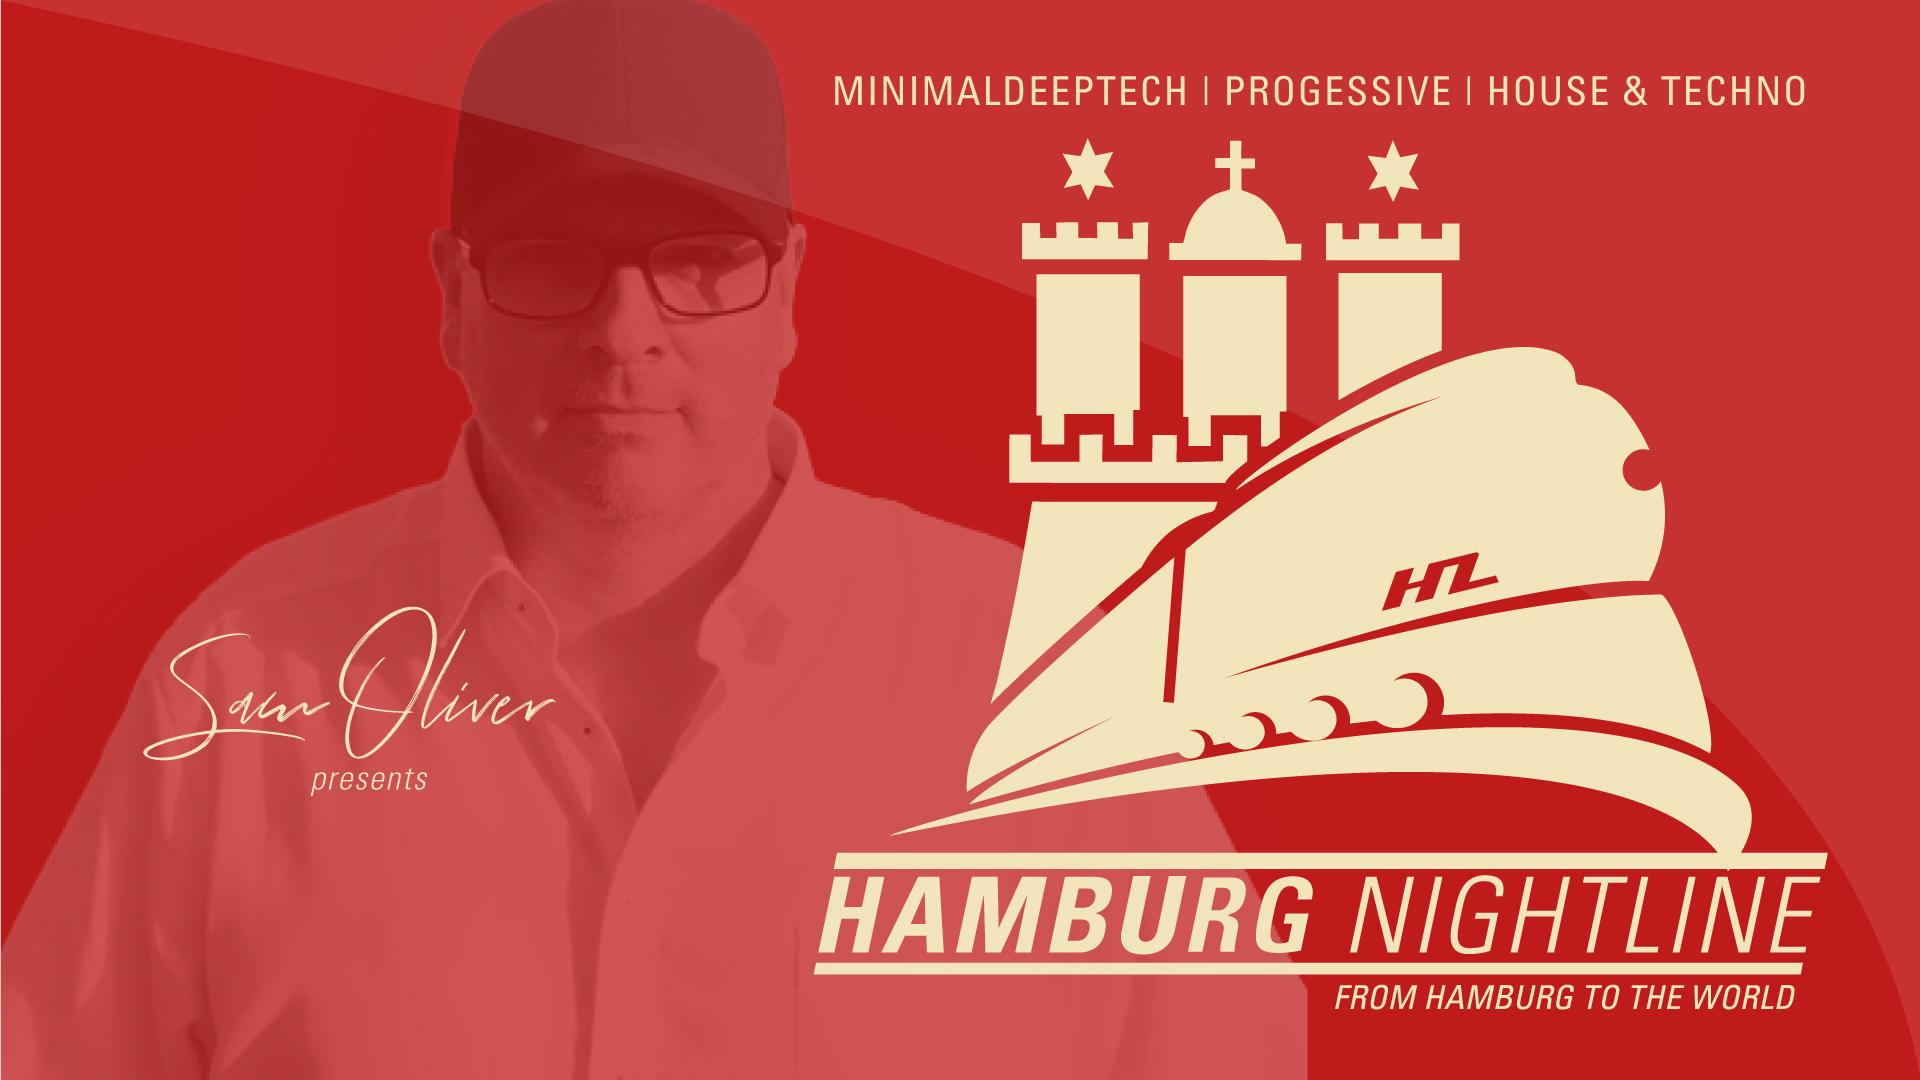 HAMBURG NIGHTLINE with Sam Oliver